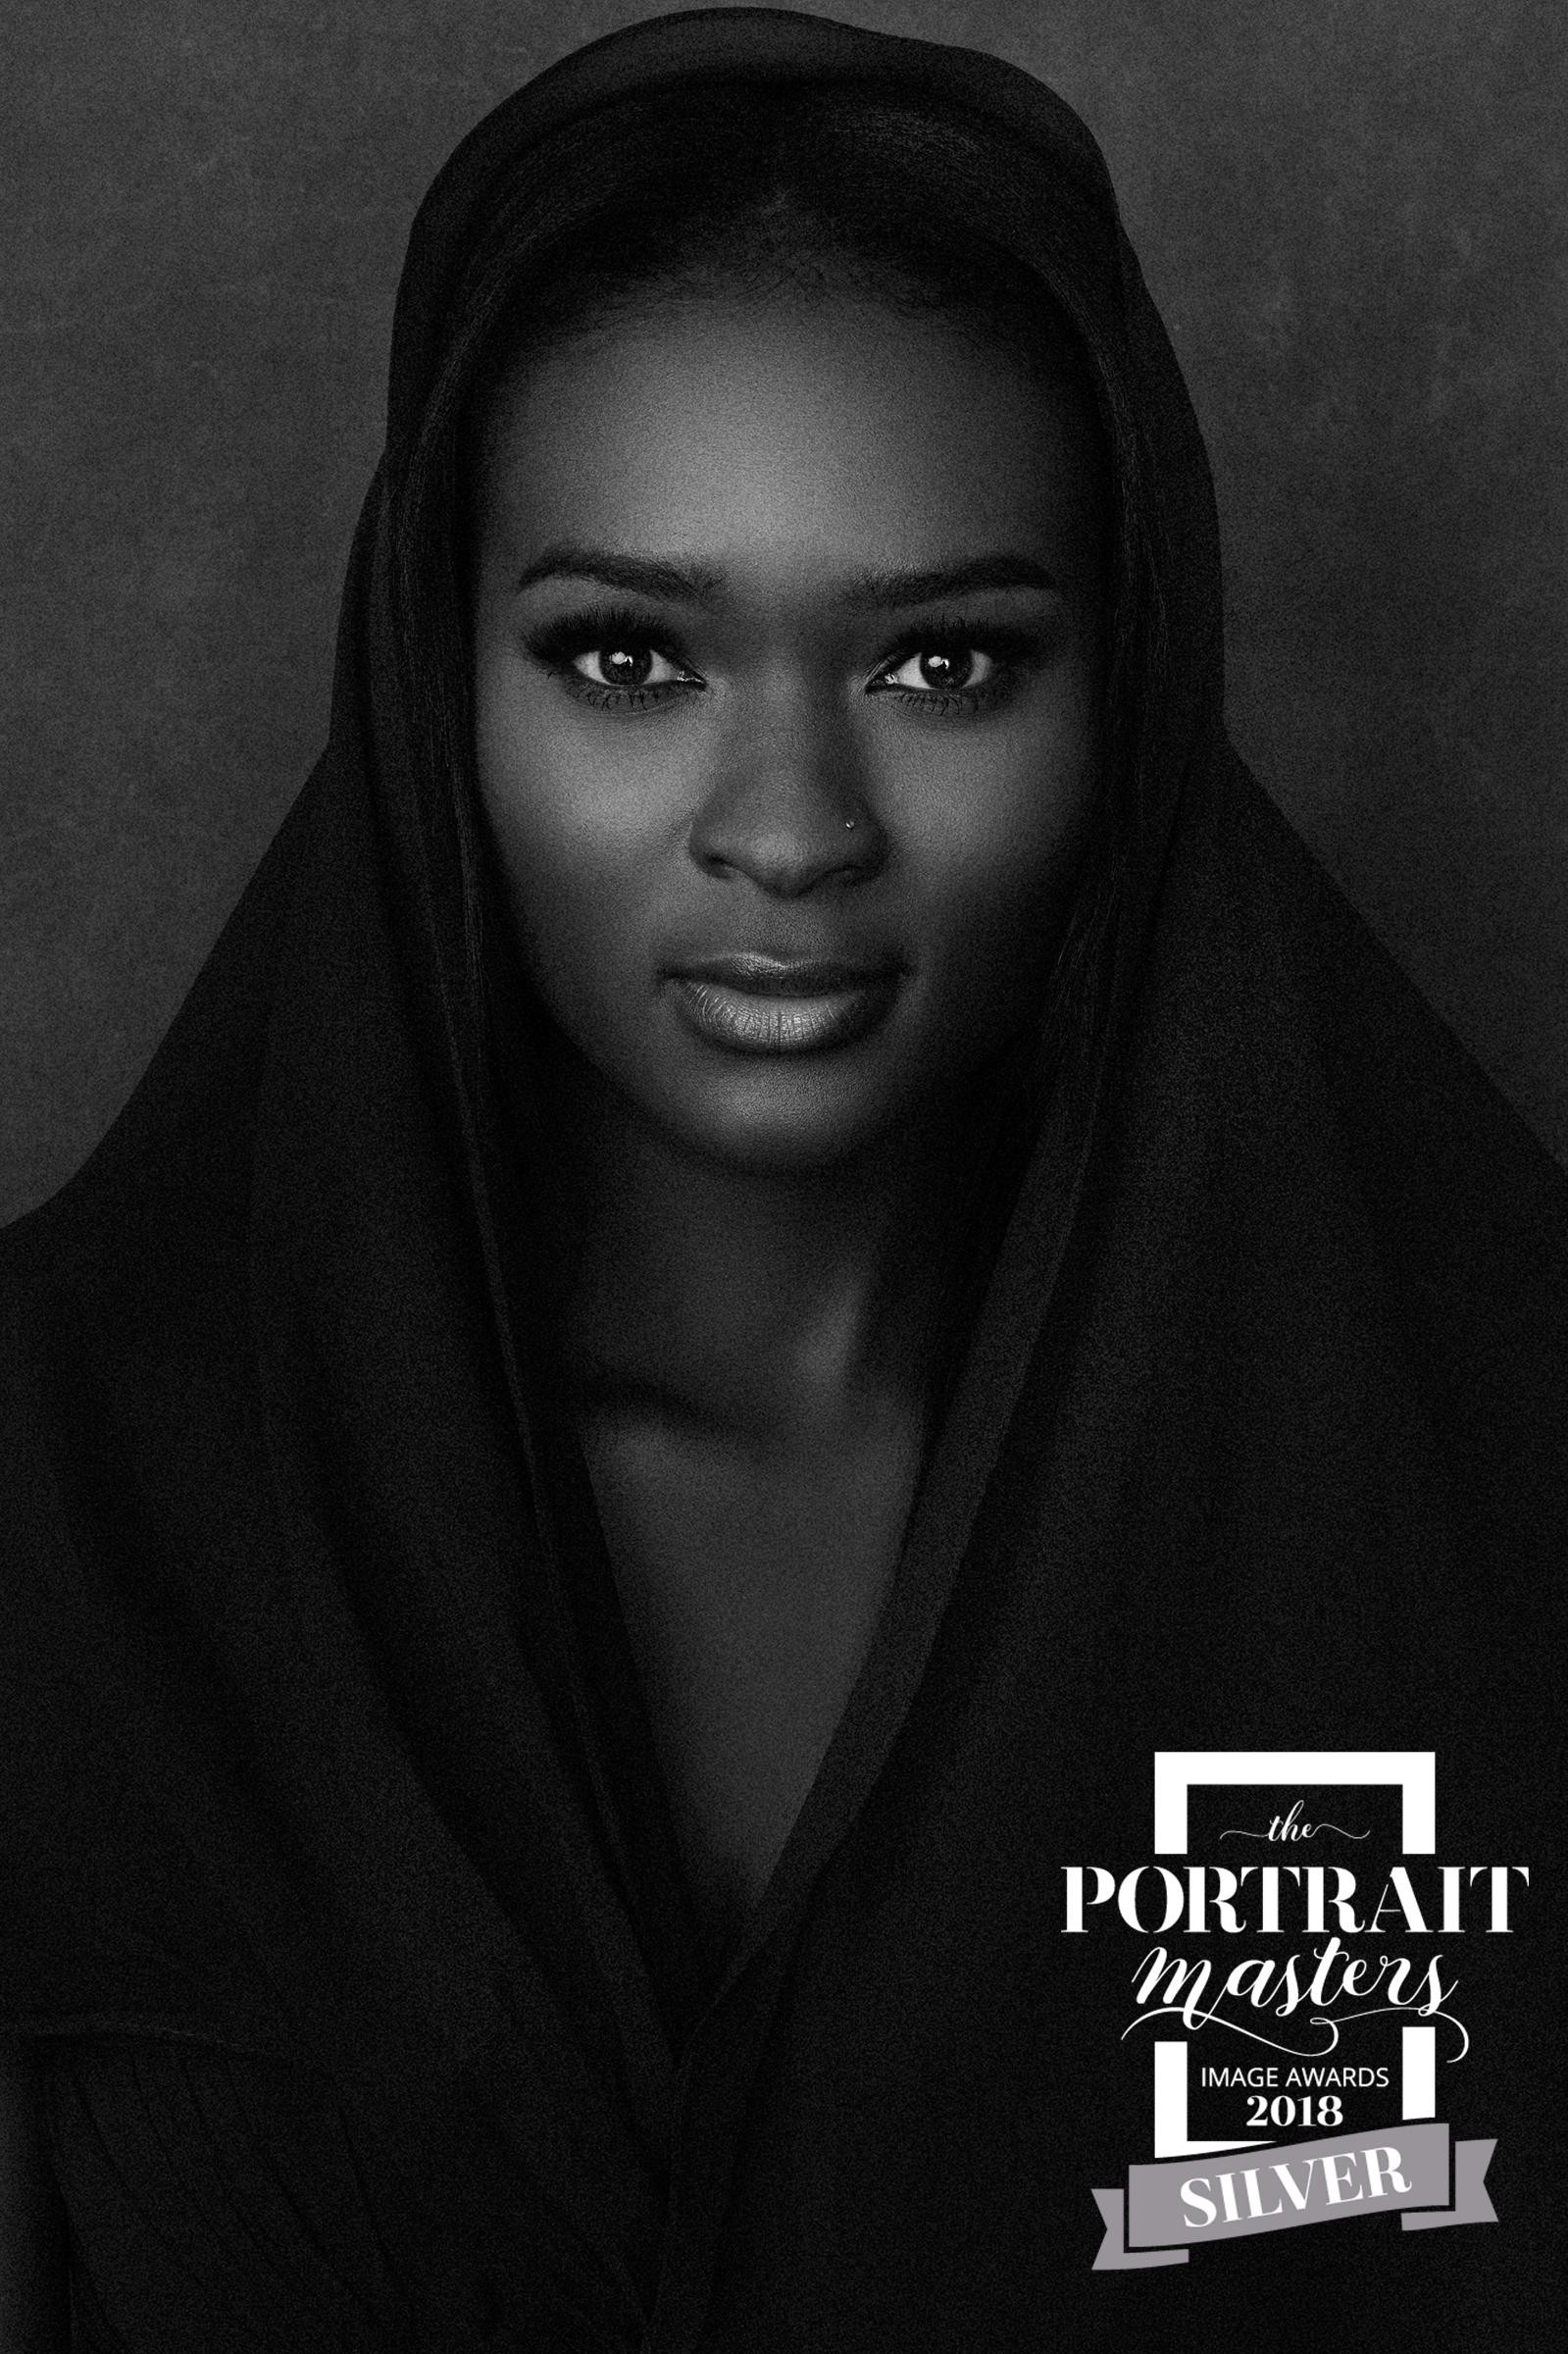 portraitmasters-silver2018.jpg